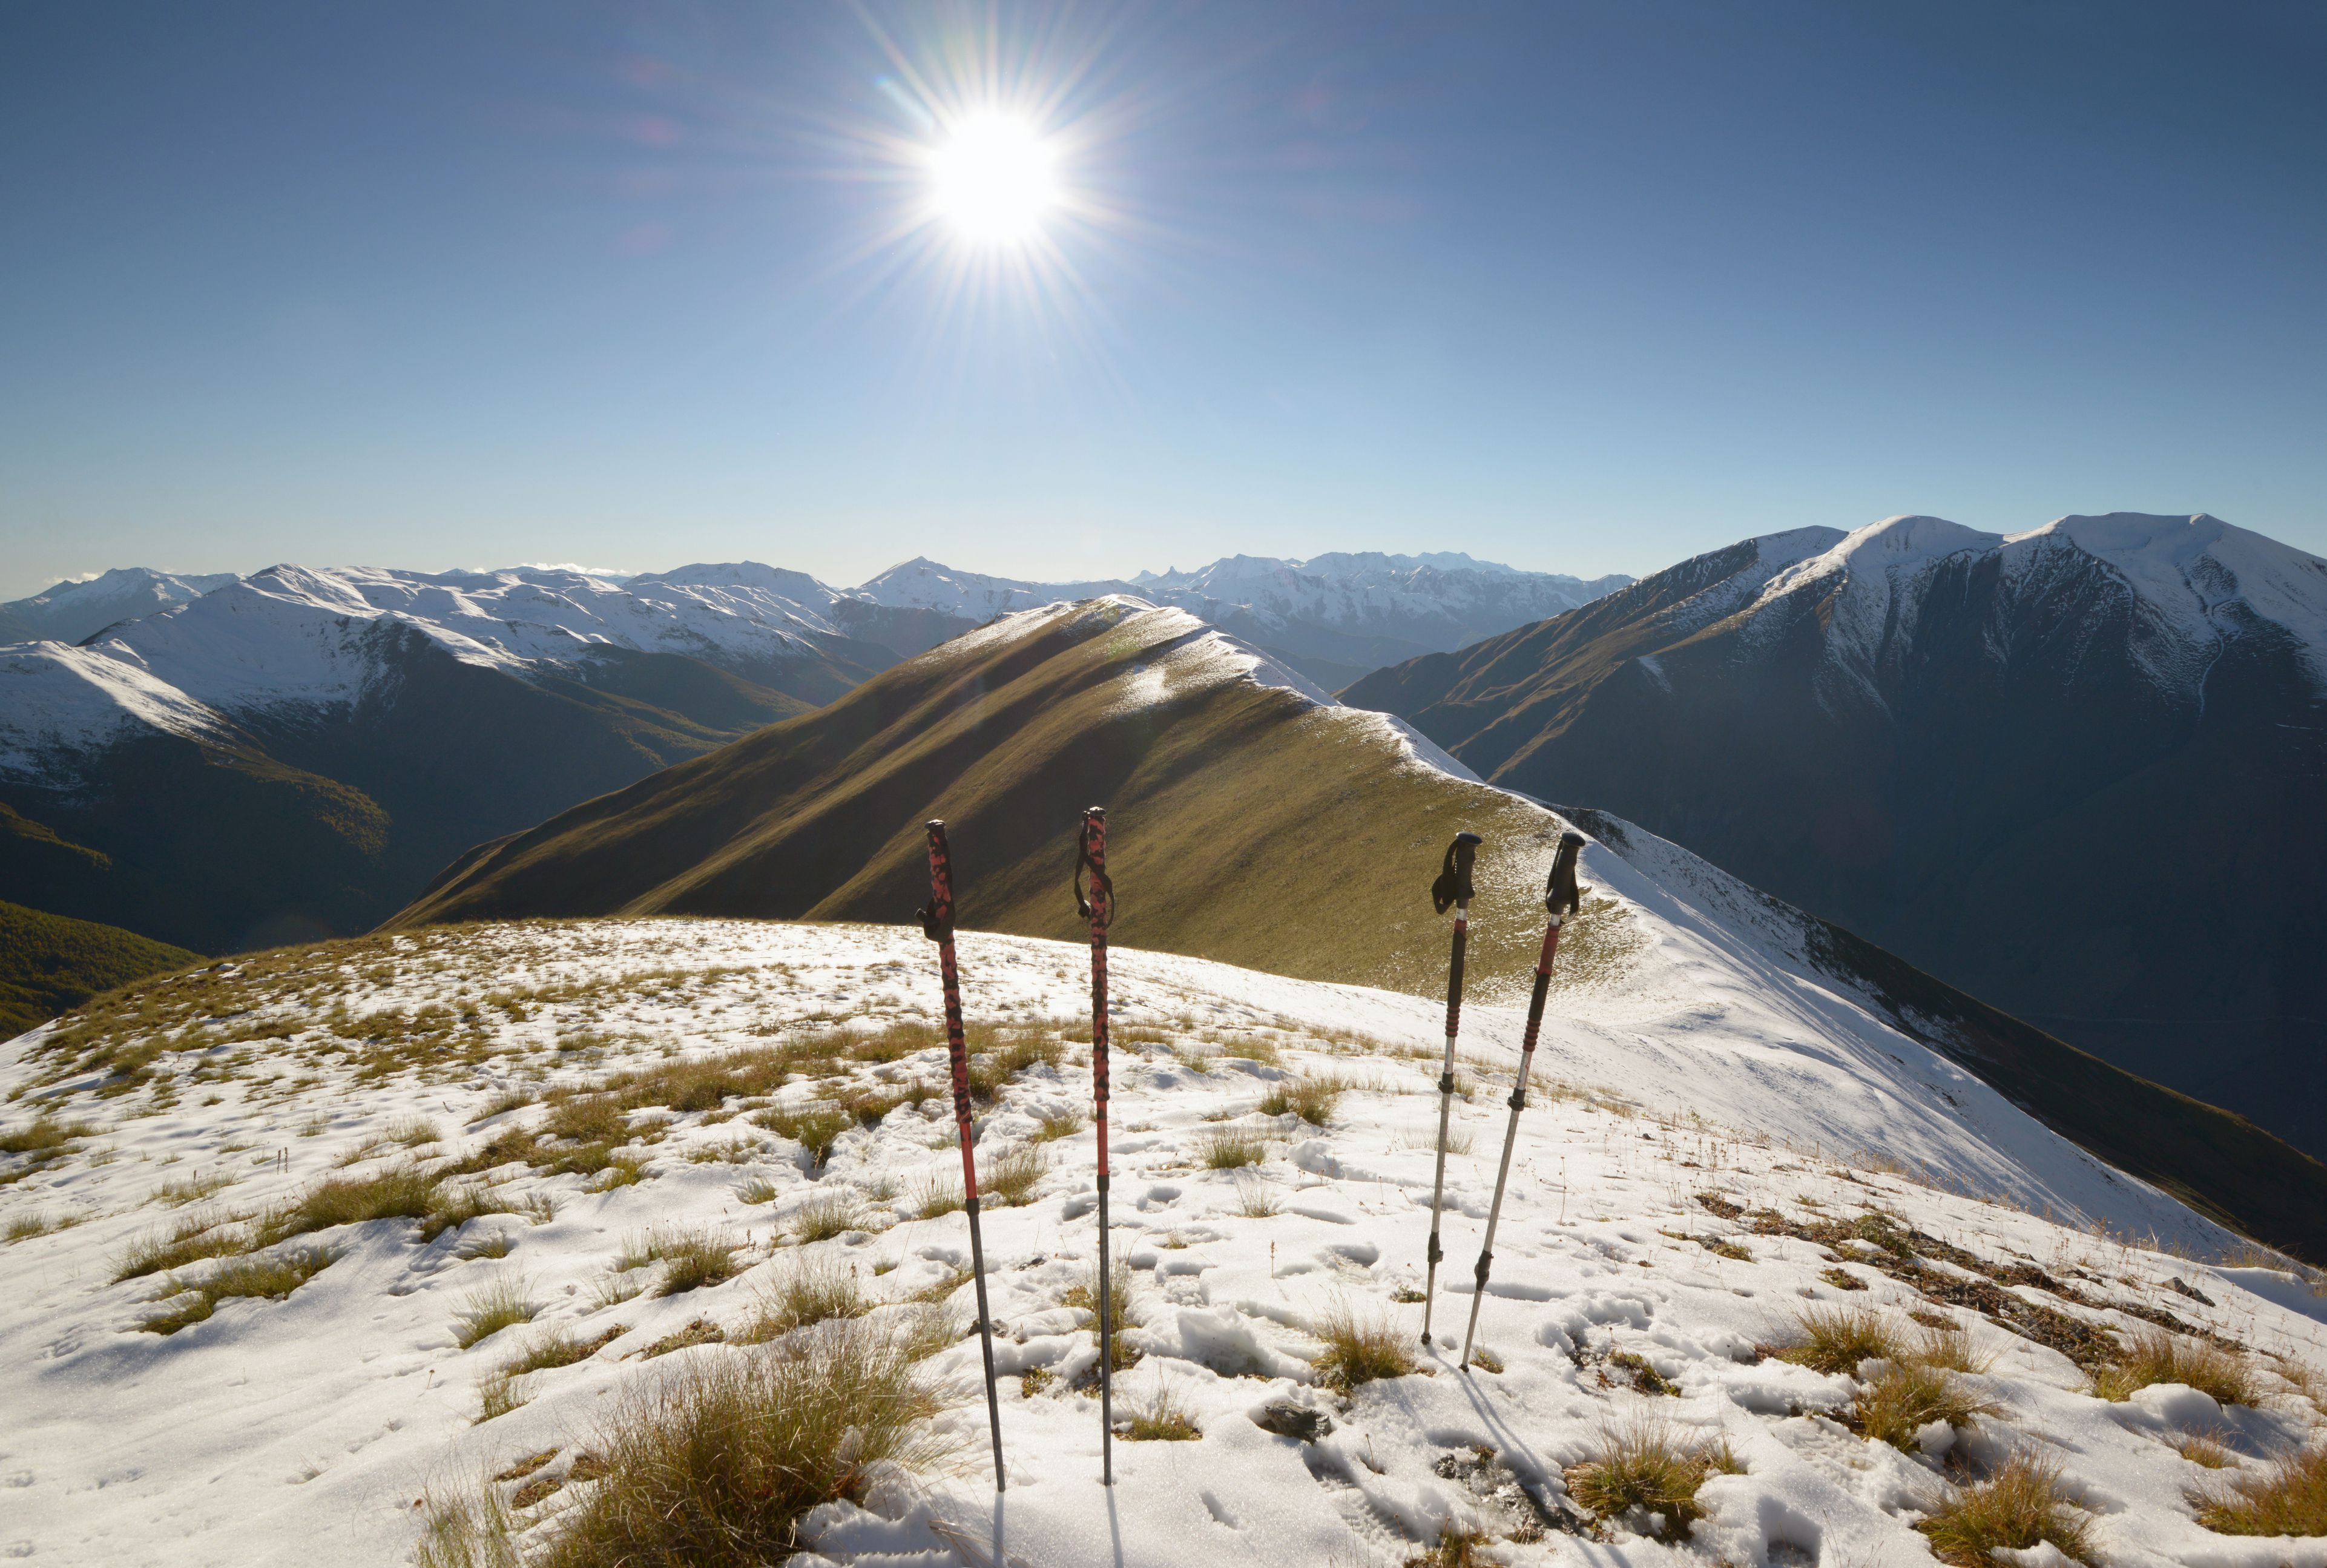 Hiking poles on top of a mountain ridge